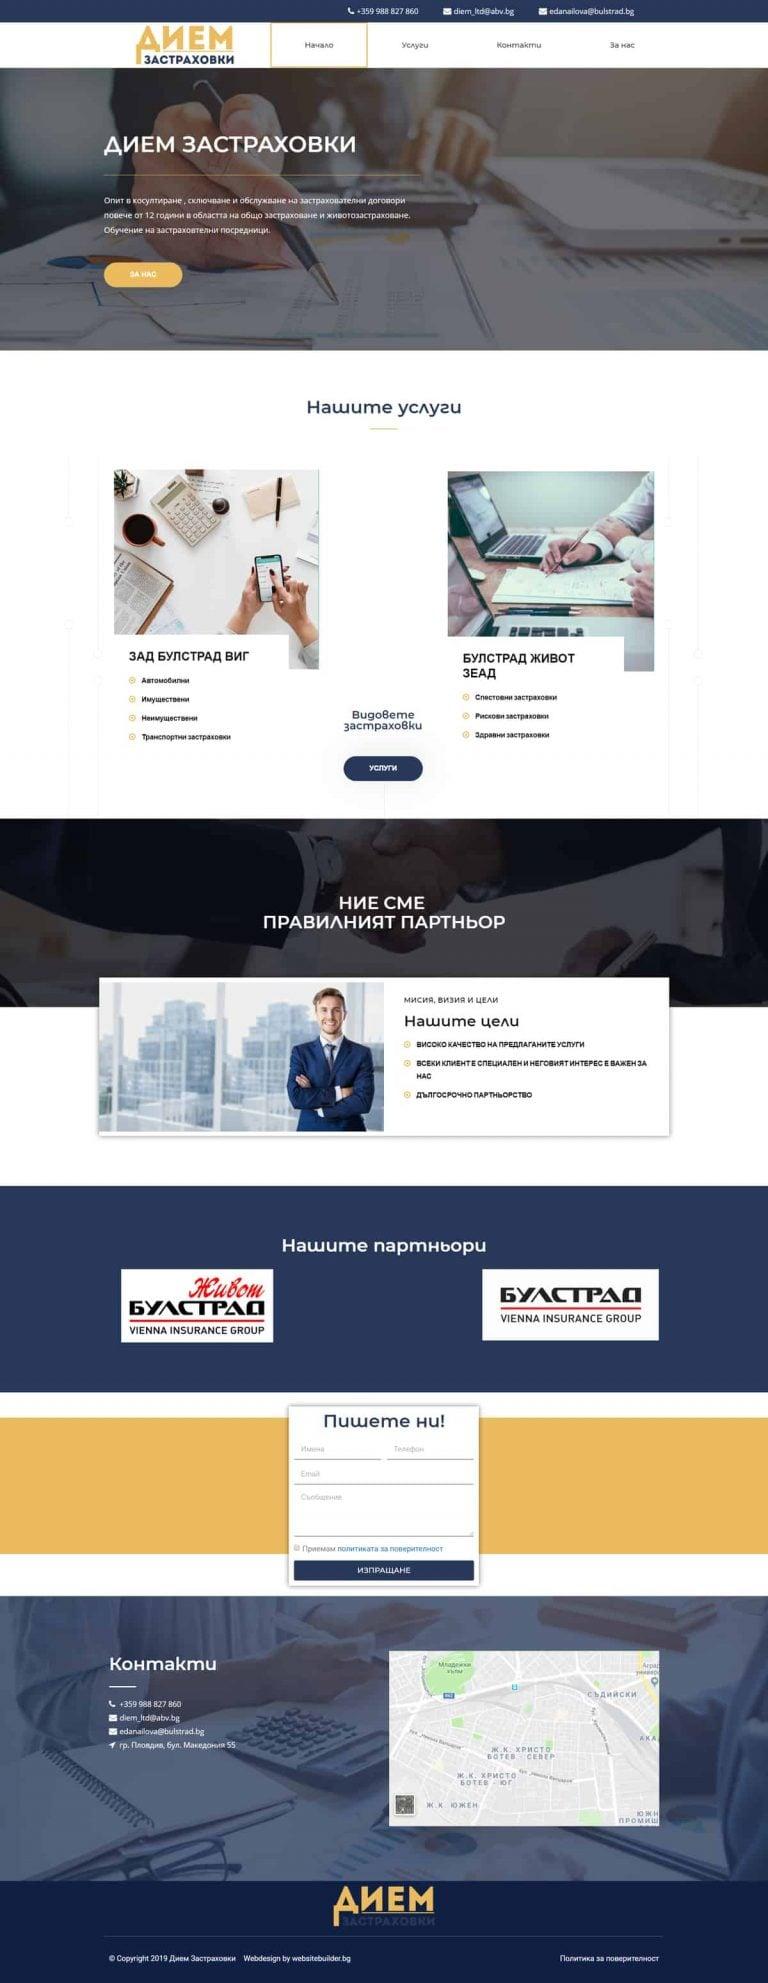 screencapture-diem-zastrahovki-2019-06-19-14_50_38